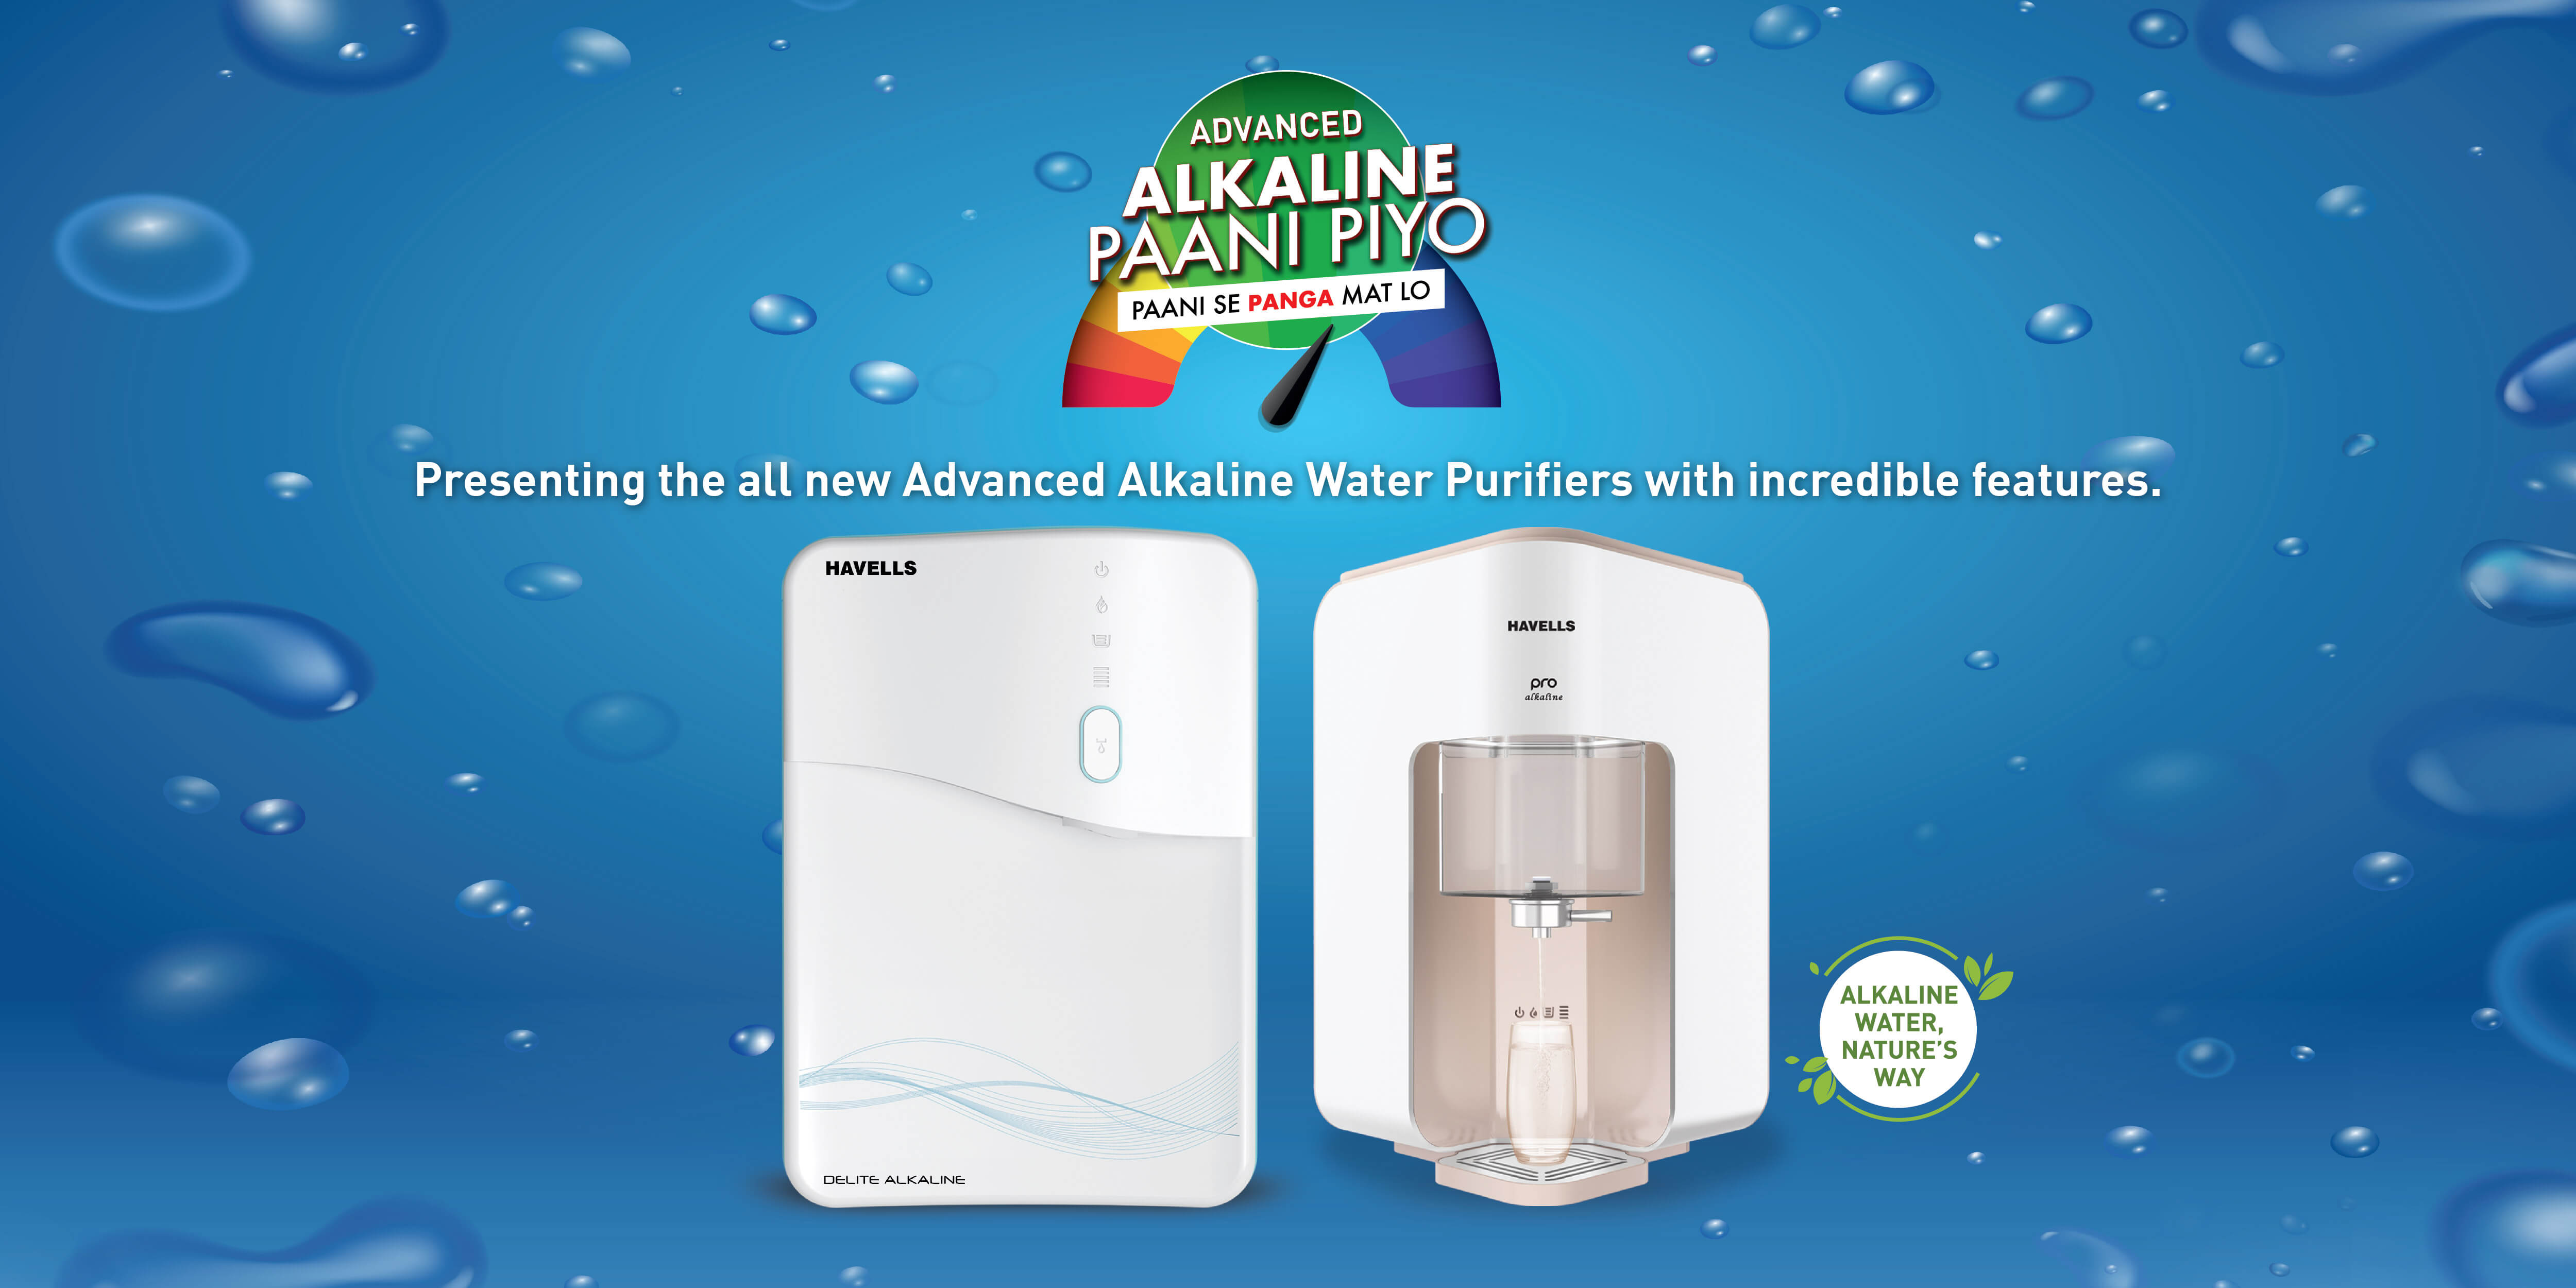 alkaline-water-purifier